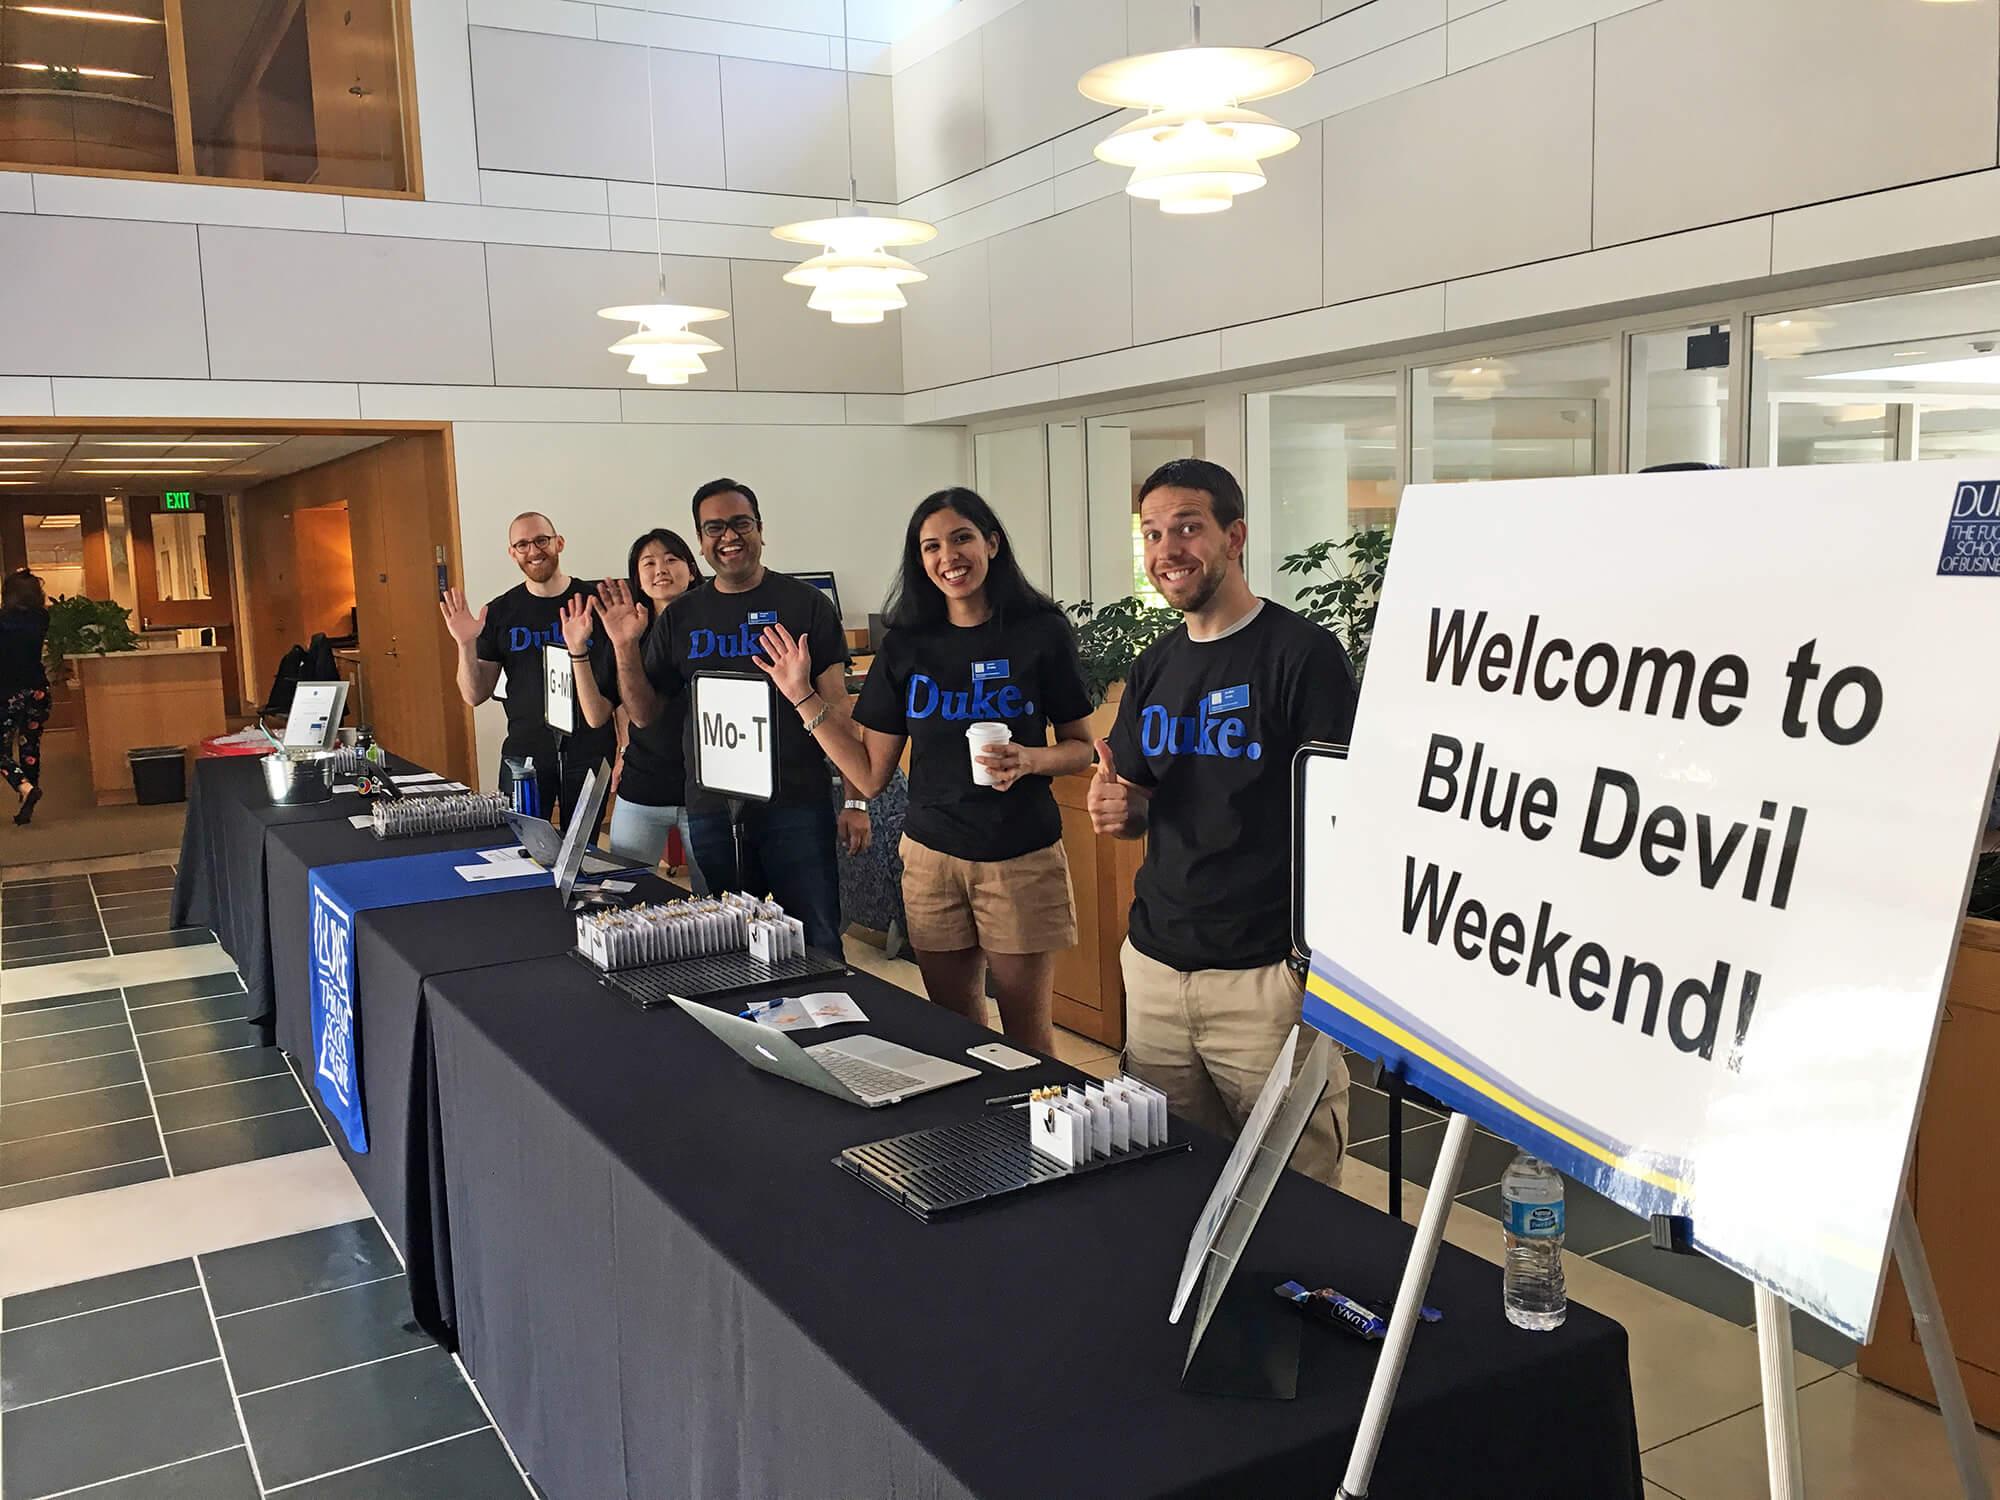 Blue Devil Weekend highlights